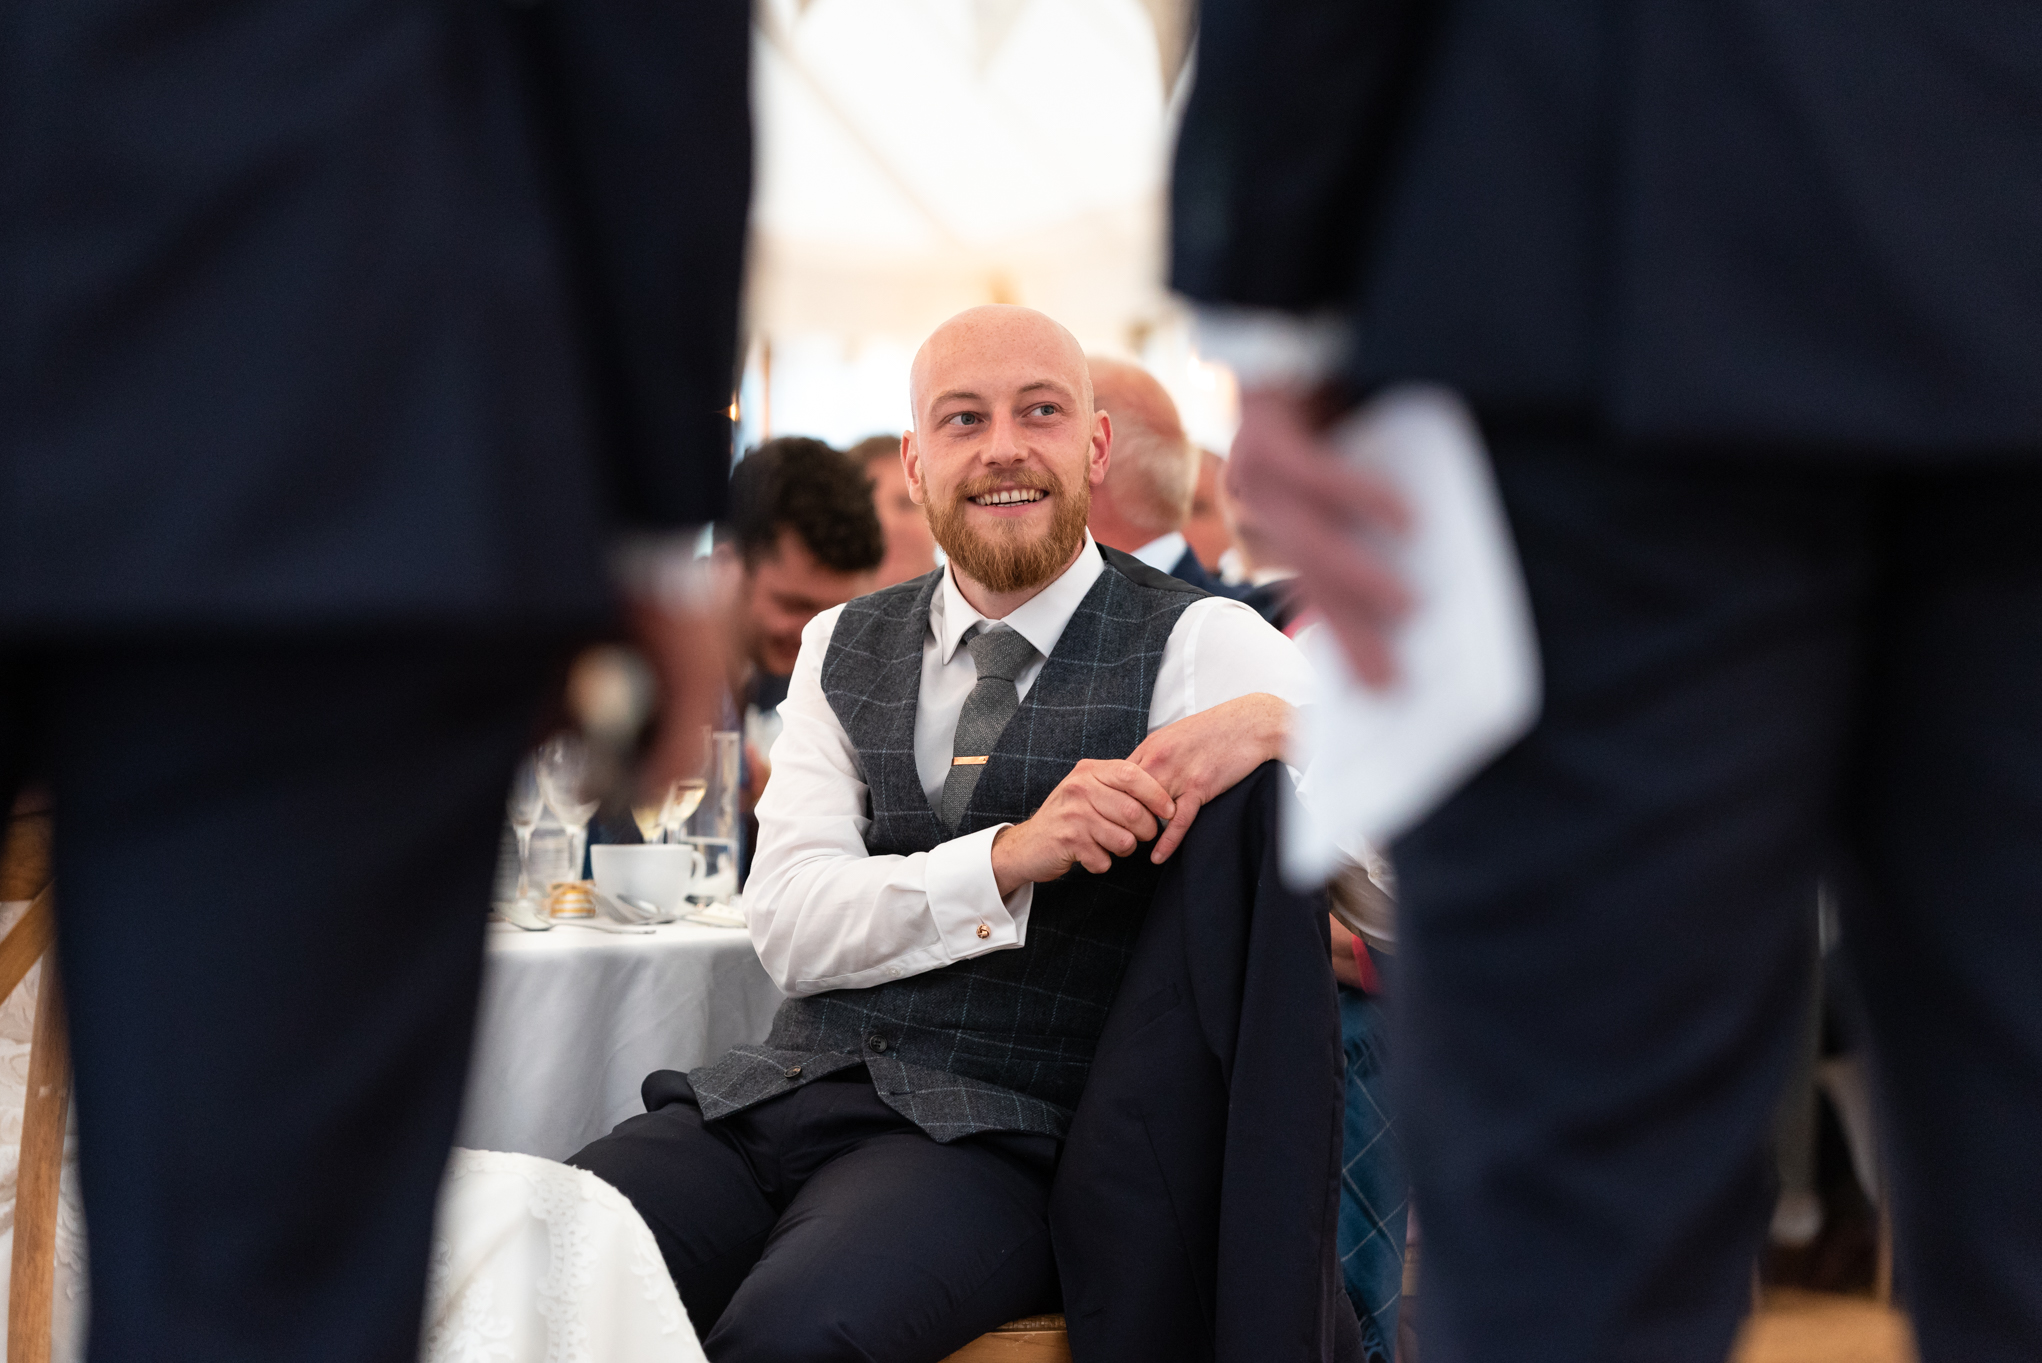 Groom during wedding speech - Powys Wedding Photography